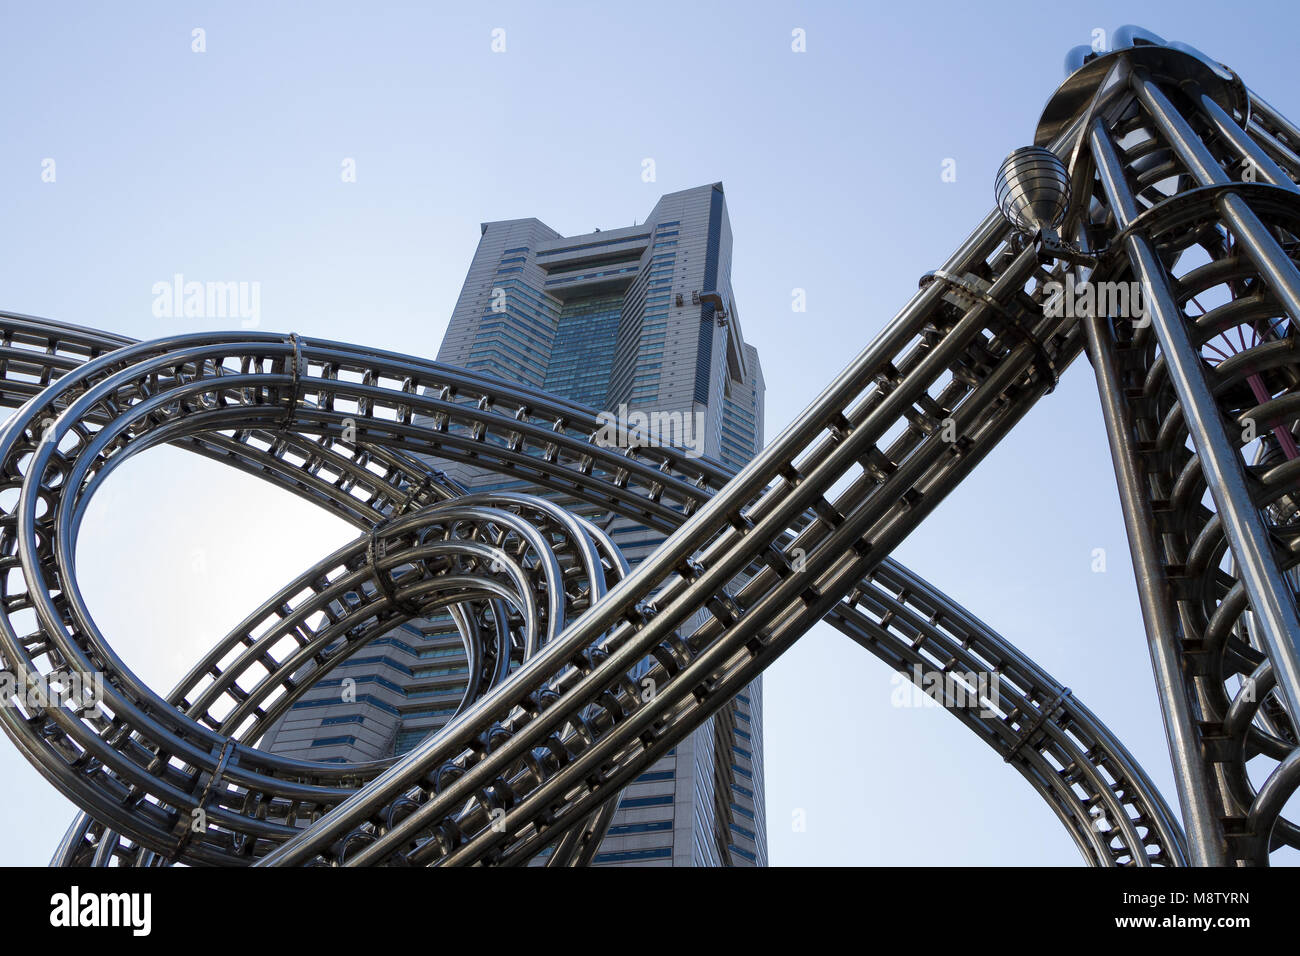 Landmark Tower in Minato Mirai, Yokohama, Kanagawa, Japan. Friday, March 2nd 2018 - Stock Image